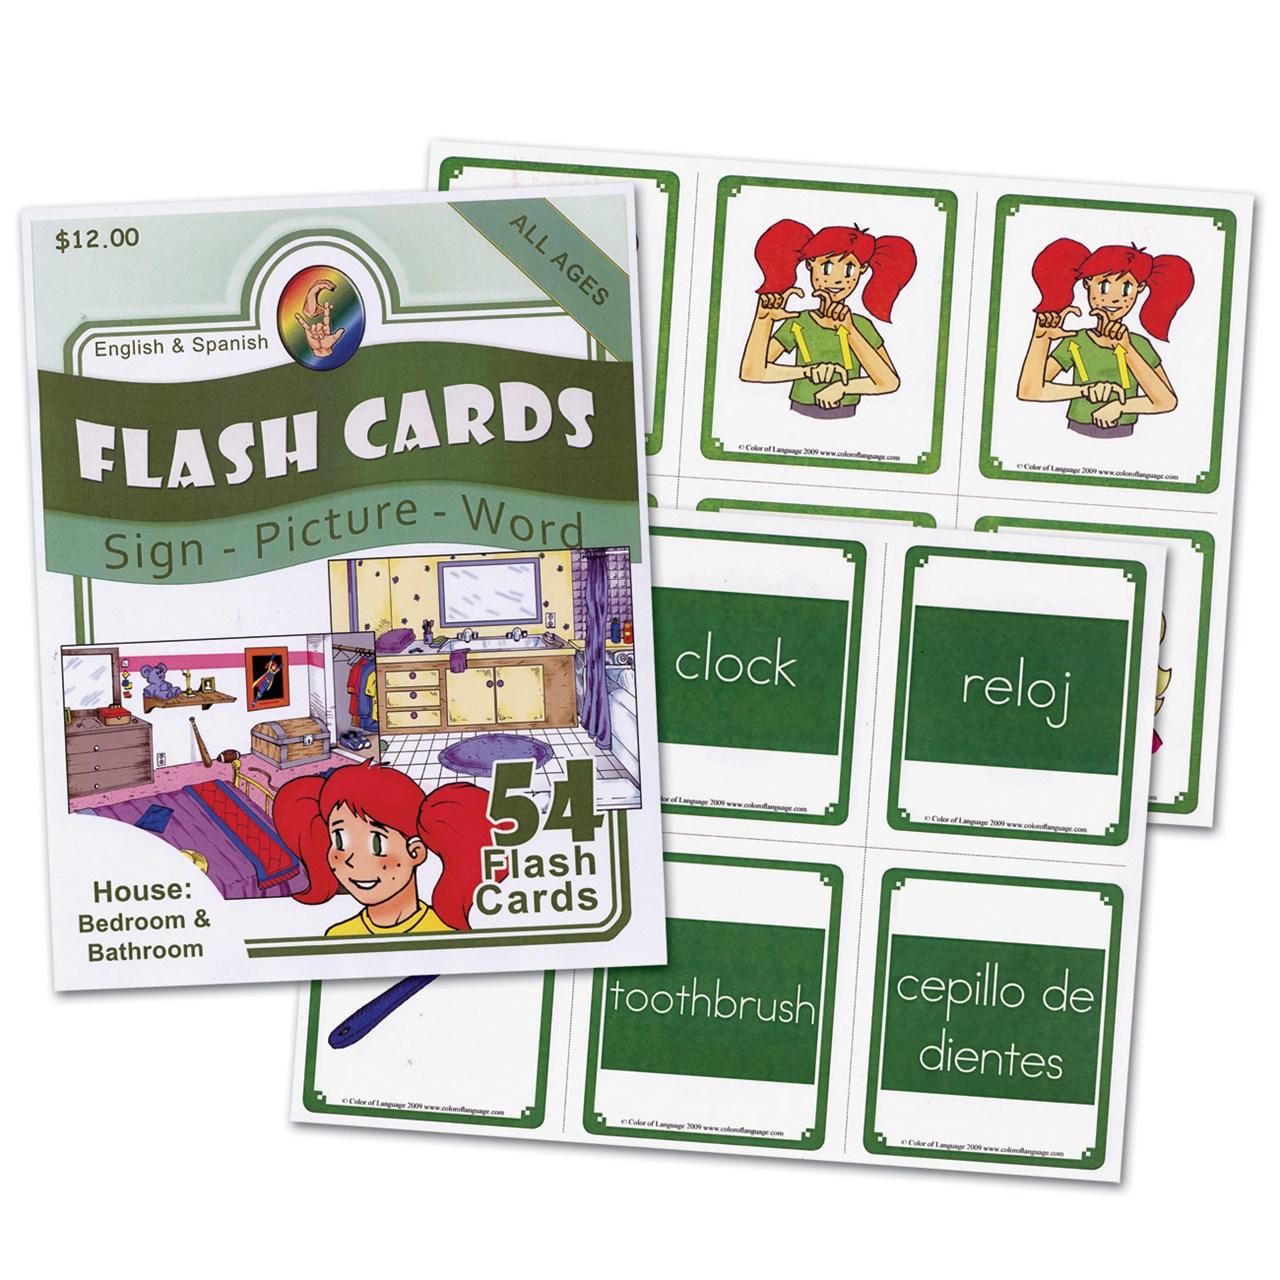 asl house flash cards bedrooms and bathrooms - Asl Bathroom